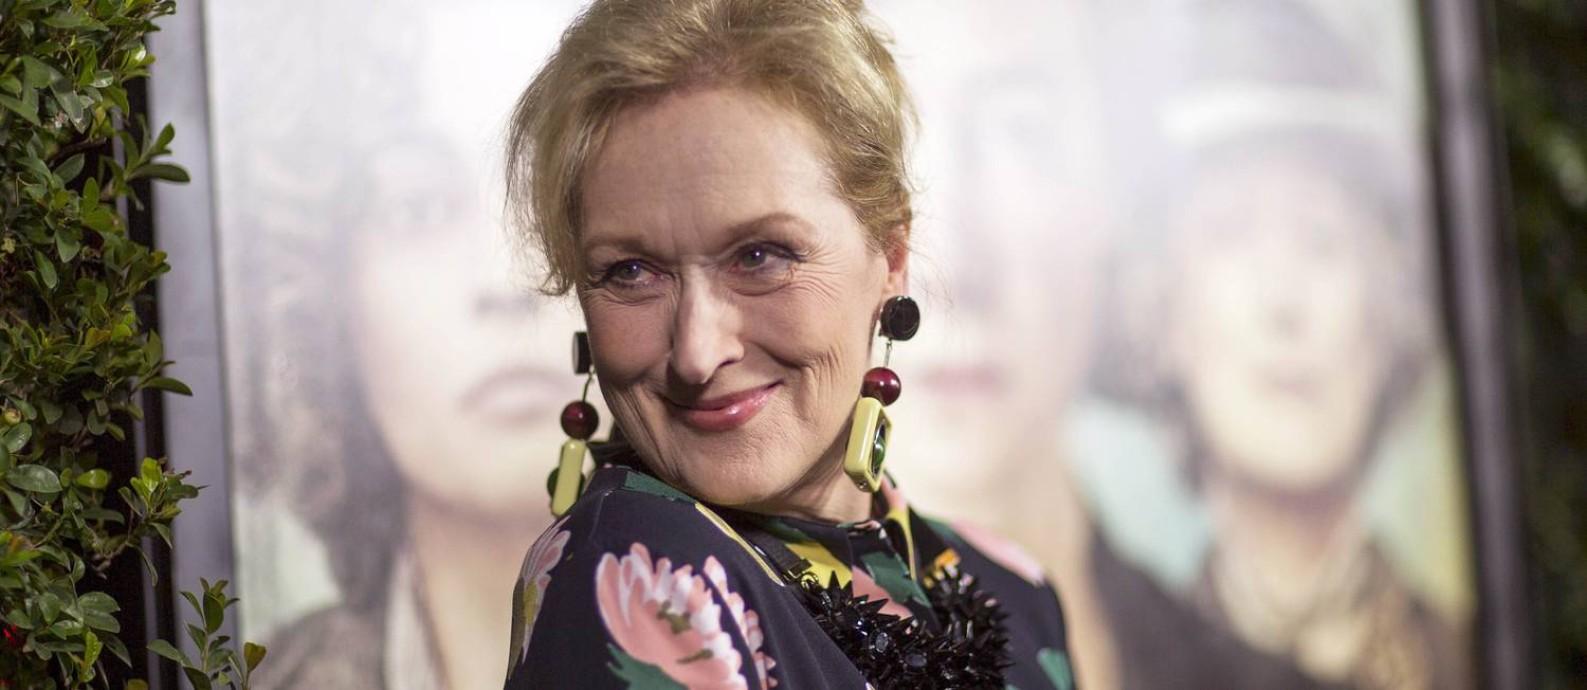 A atriz Meryl Streep vai receber o prêmio Cecil B. de Mille Foto: MARIO ANZUONI / REUTERS